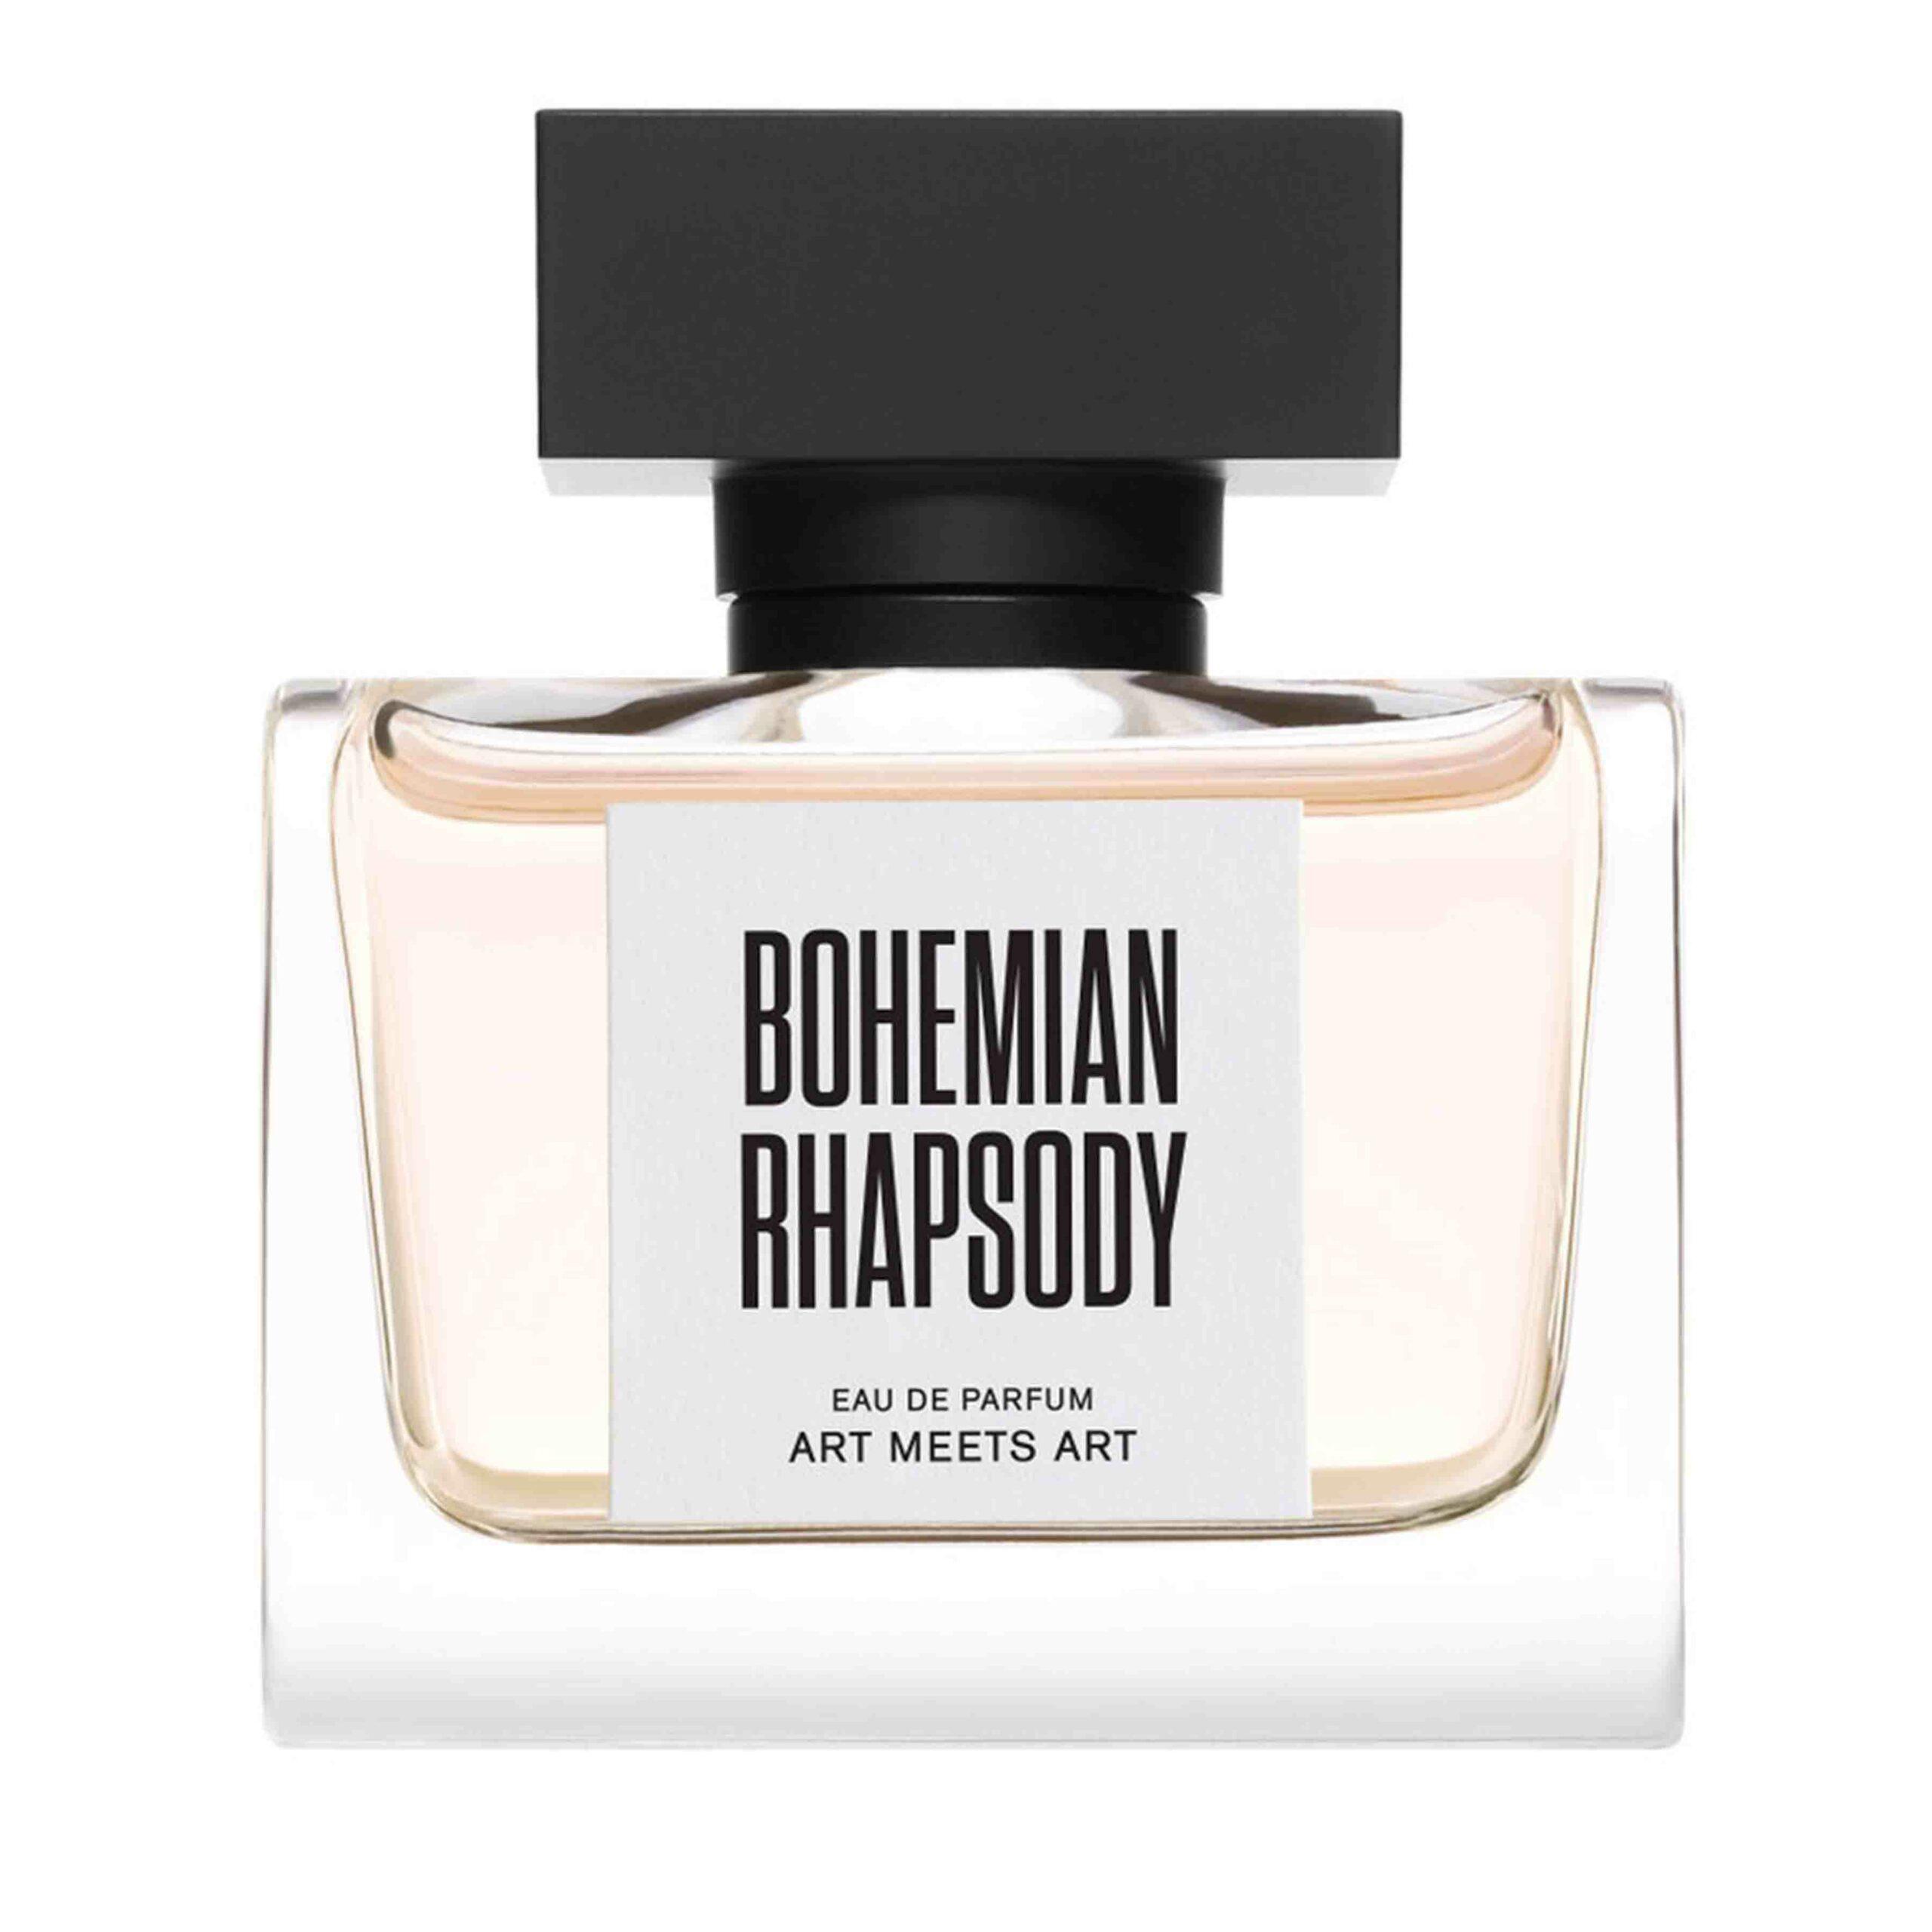 Die besten Parfums für Männer 2021: Art meets Art - Bohemian Rhapsody